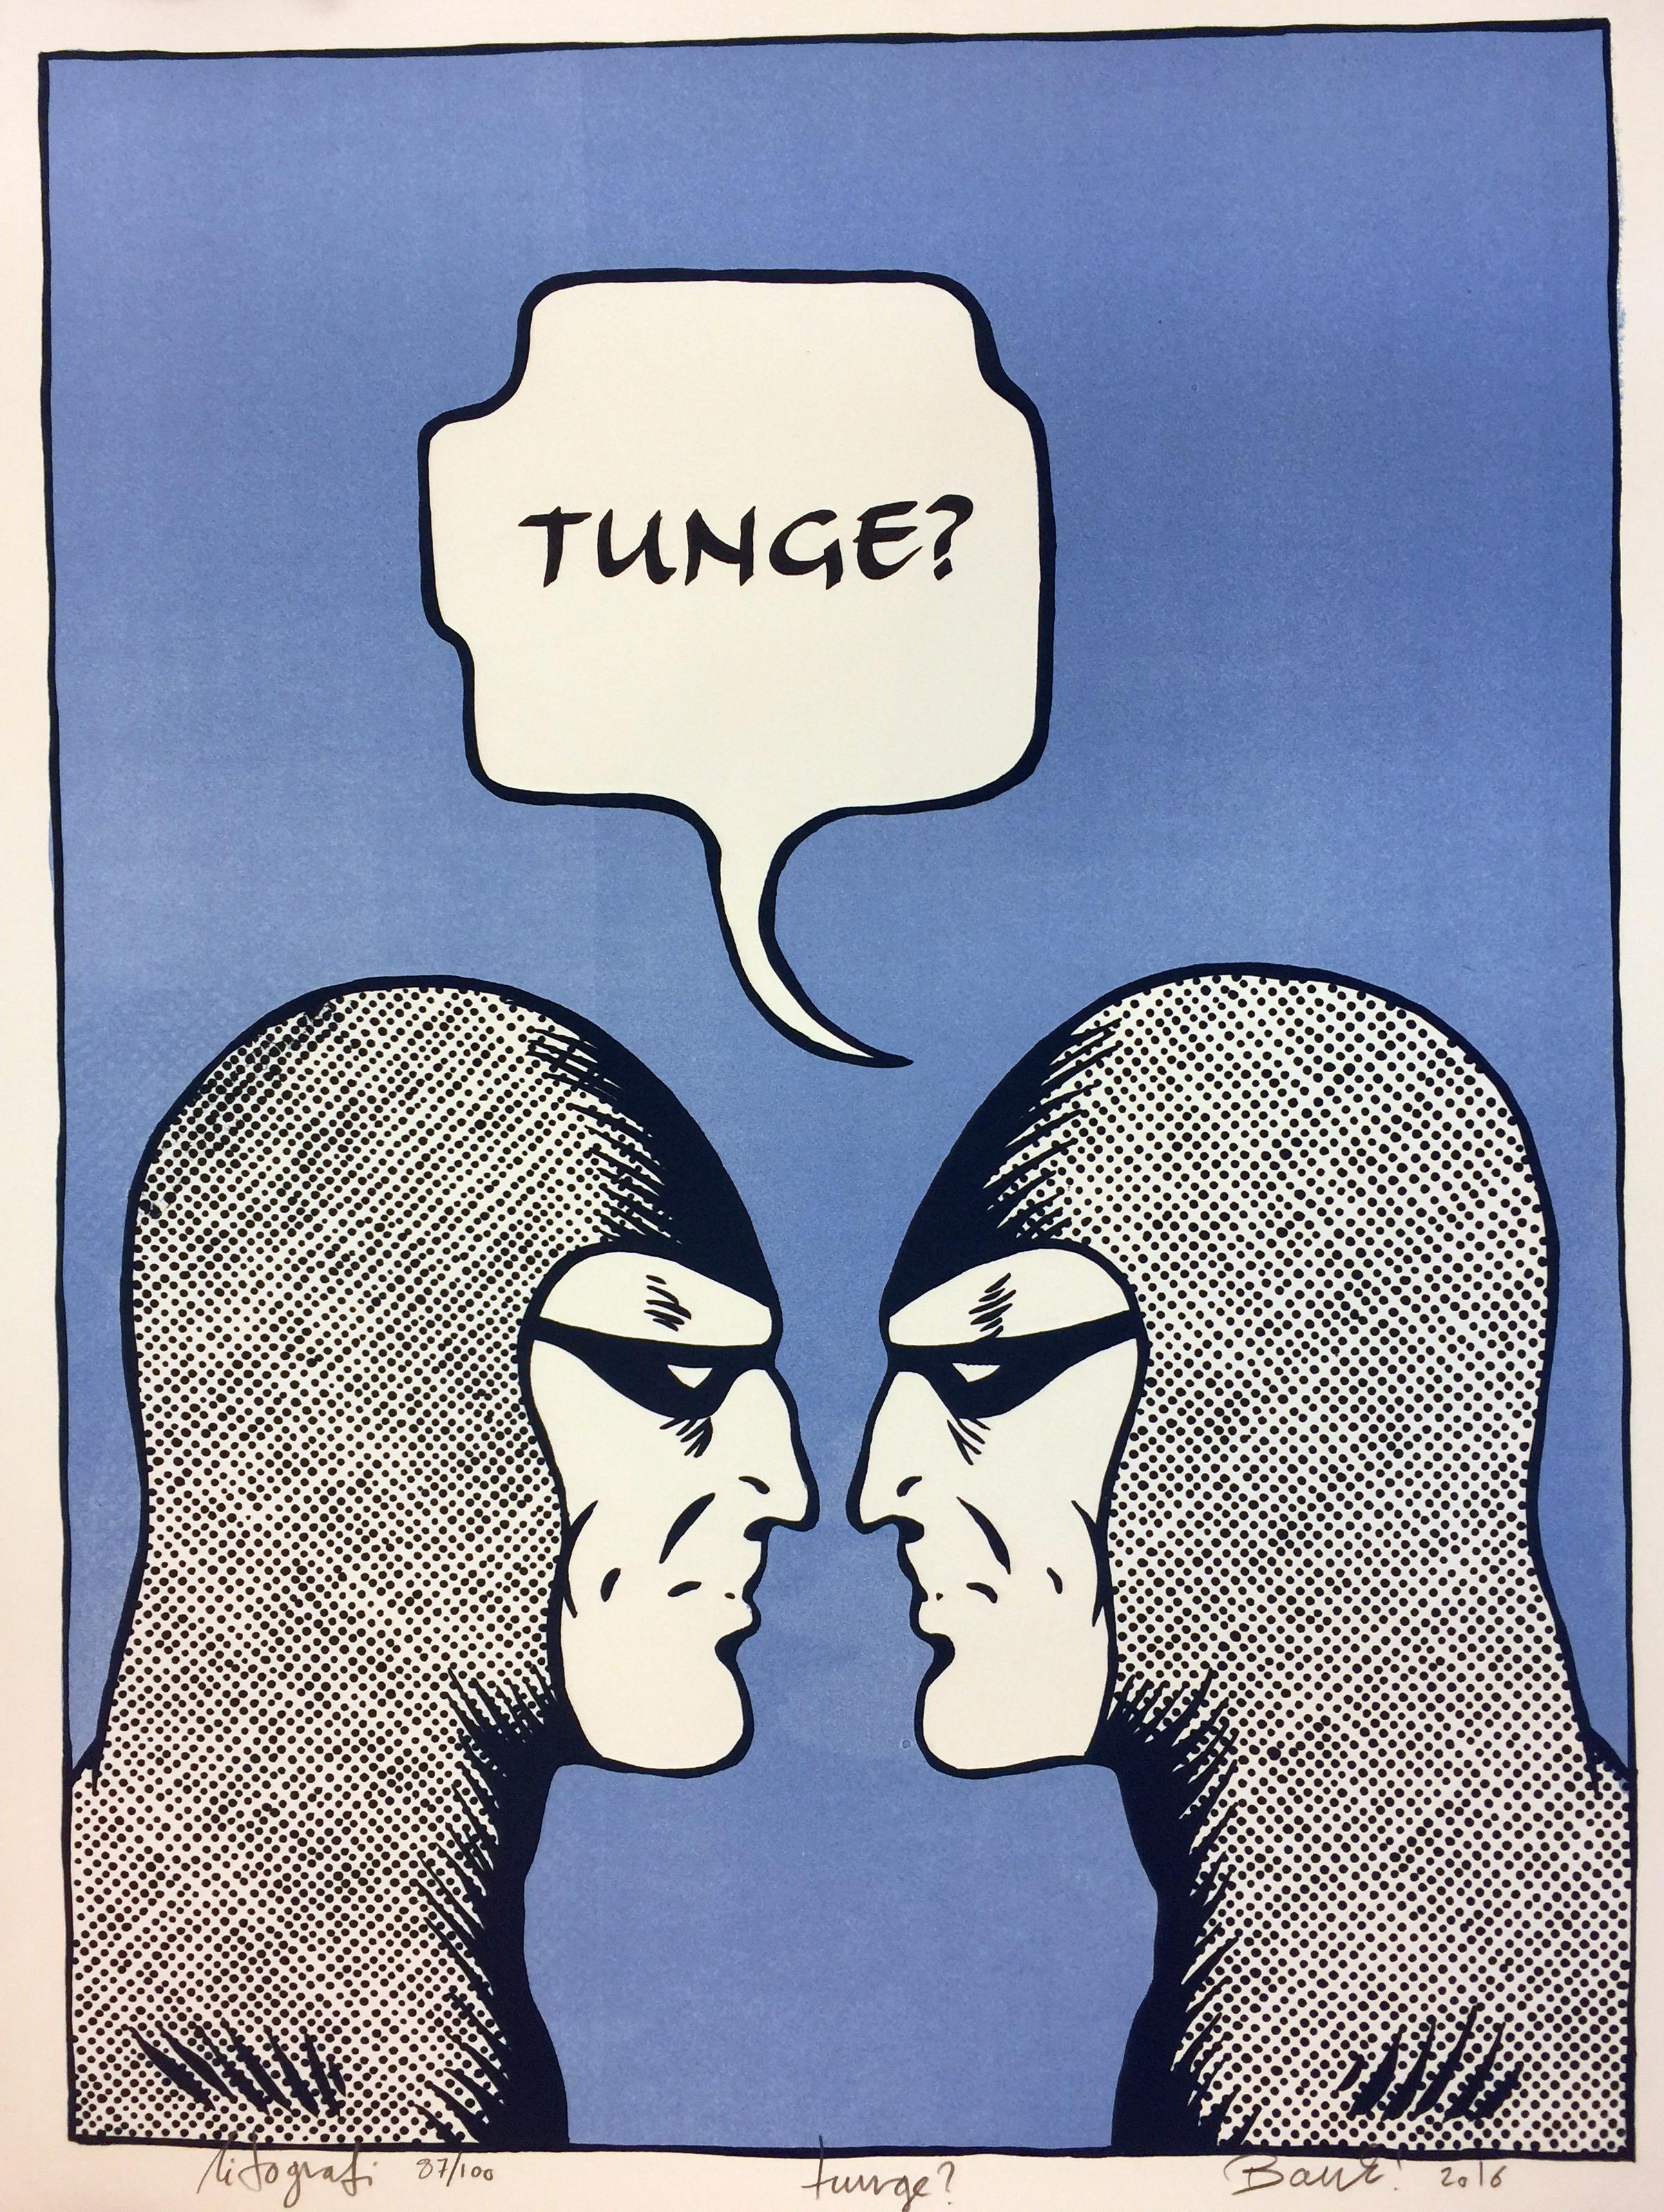 Tunge?